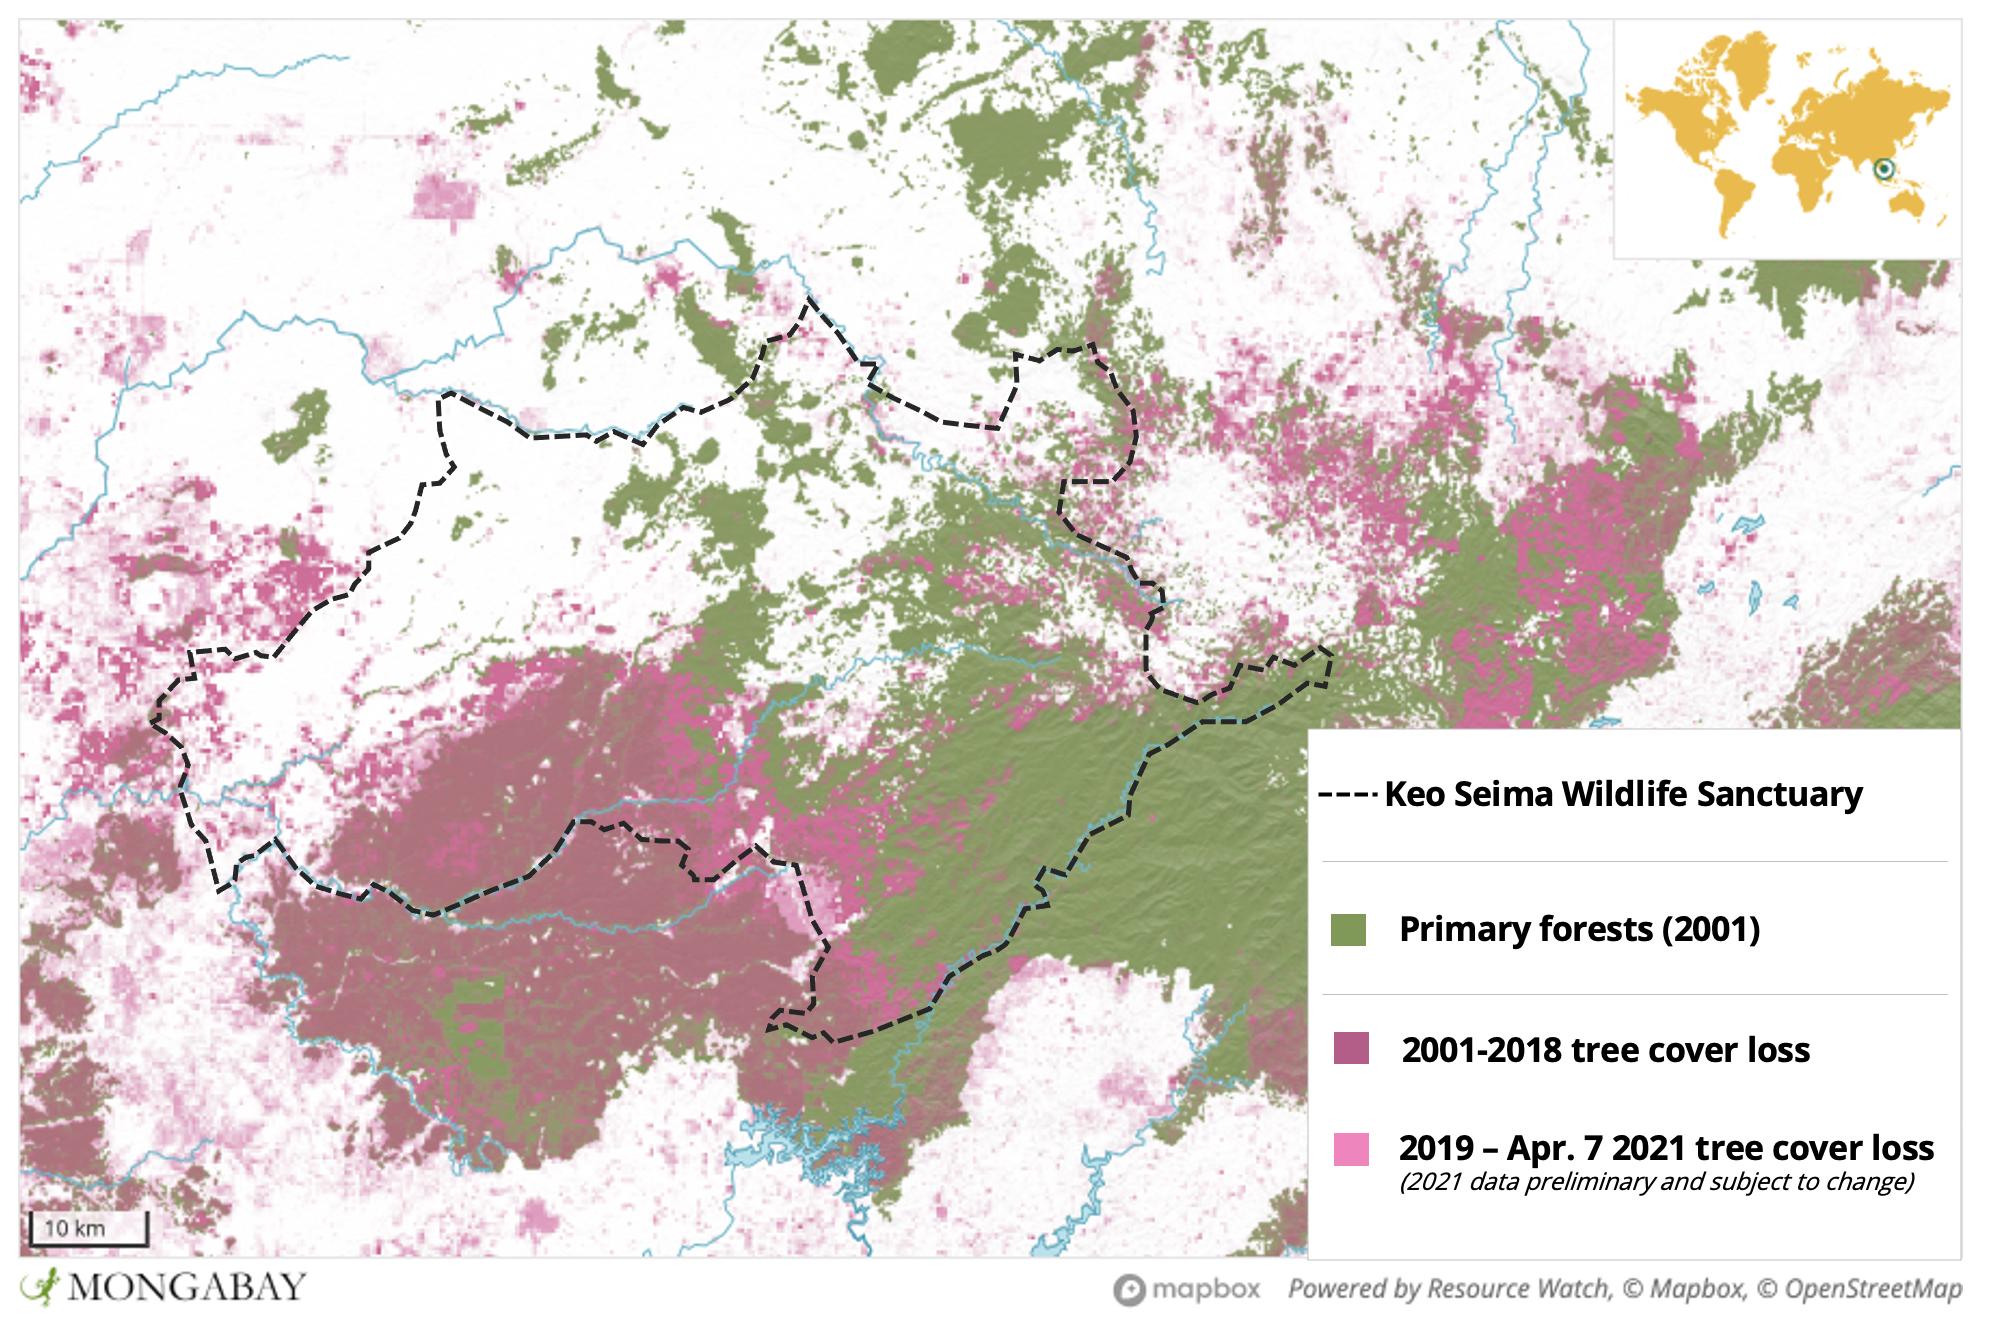 Satellite data show massive tree cover loss in and around Keo Seima Wildlife Sanctuary.